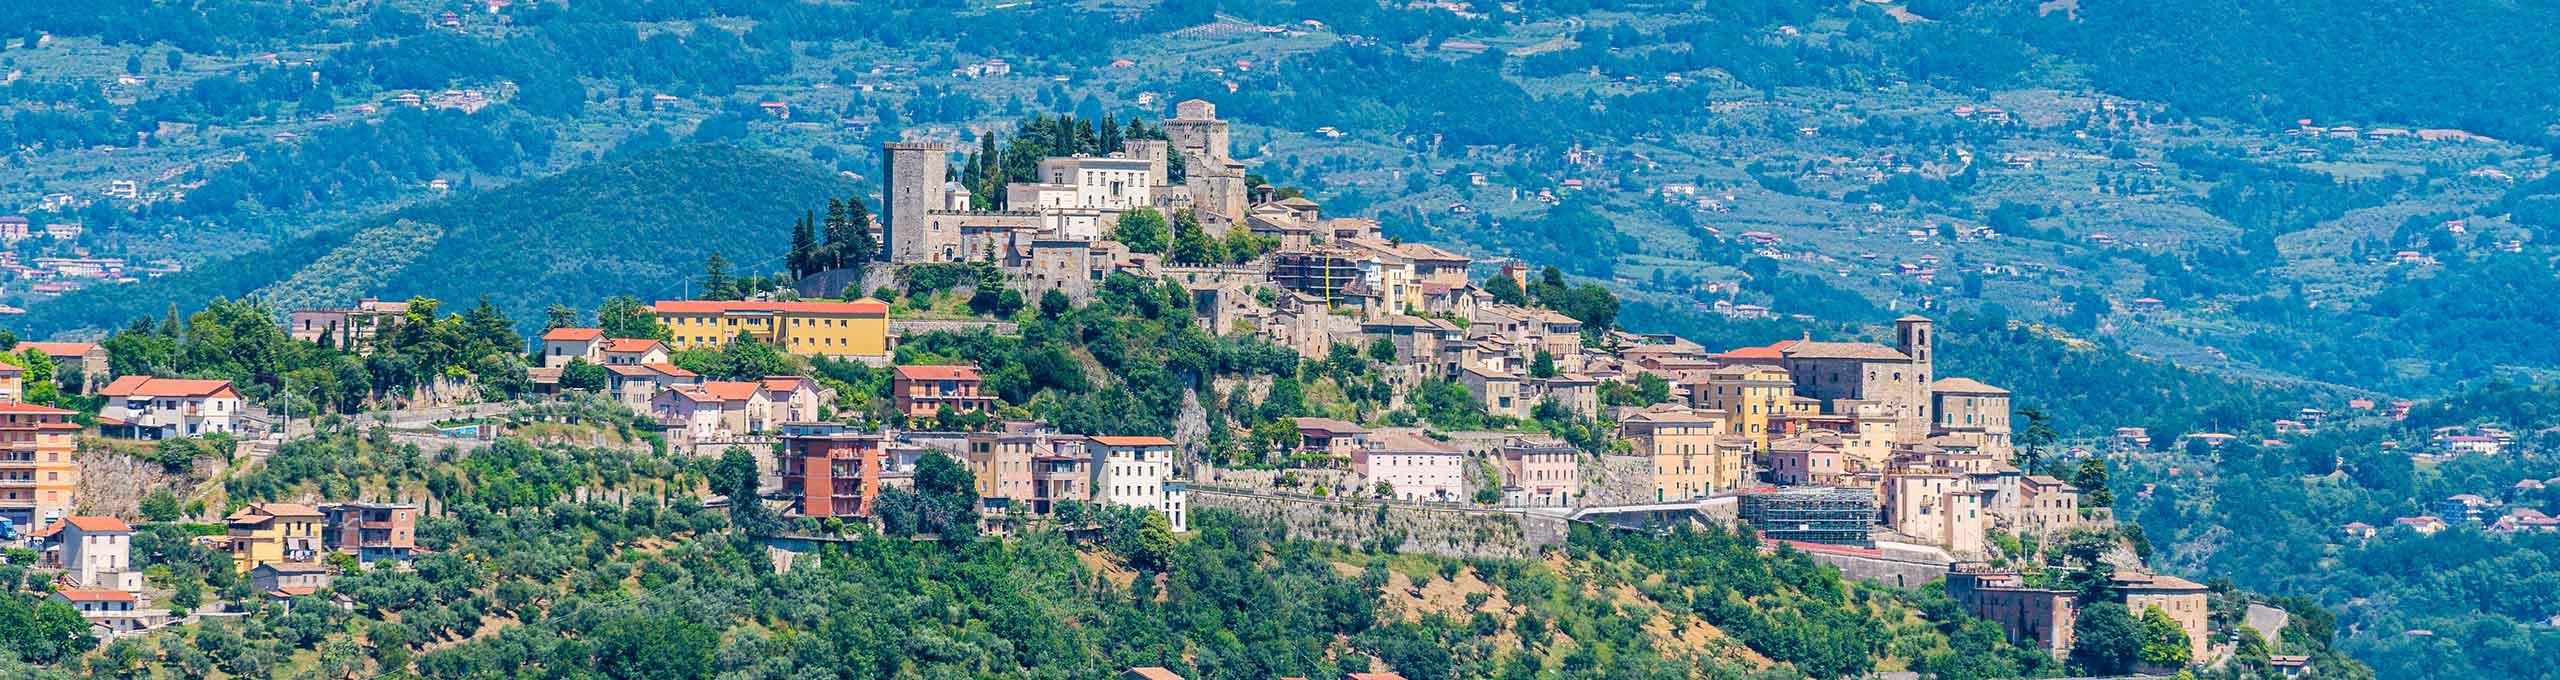 Monte San Giovanni, Ciociaria